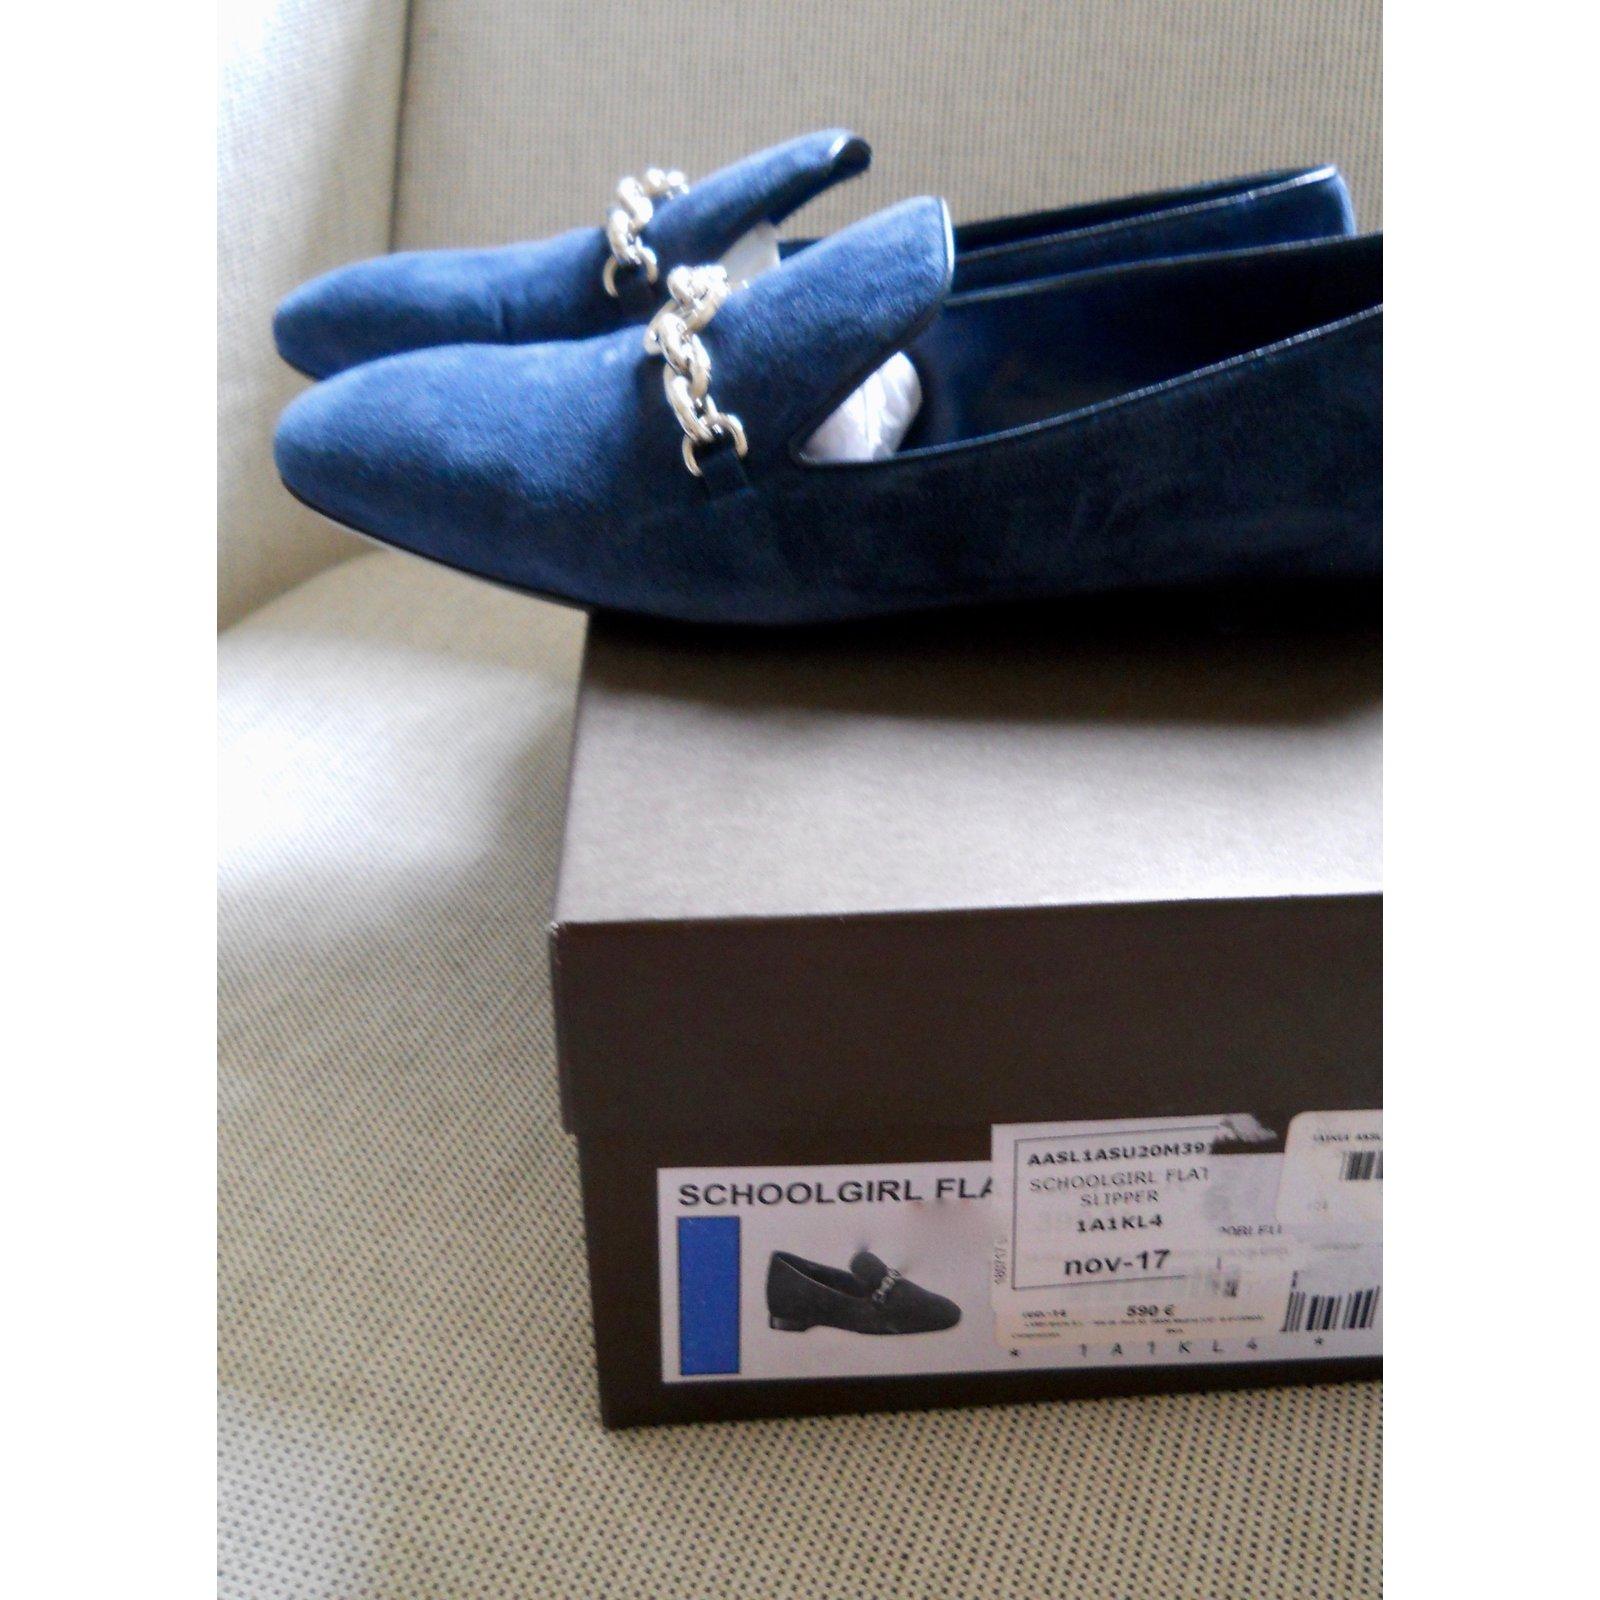 e21f1e30c9c9 Louis Vuitton Moccasins Flats Deerskin Blue